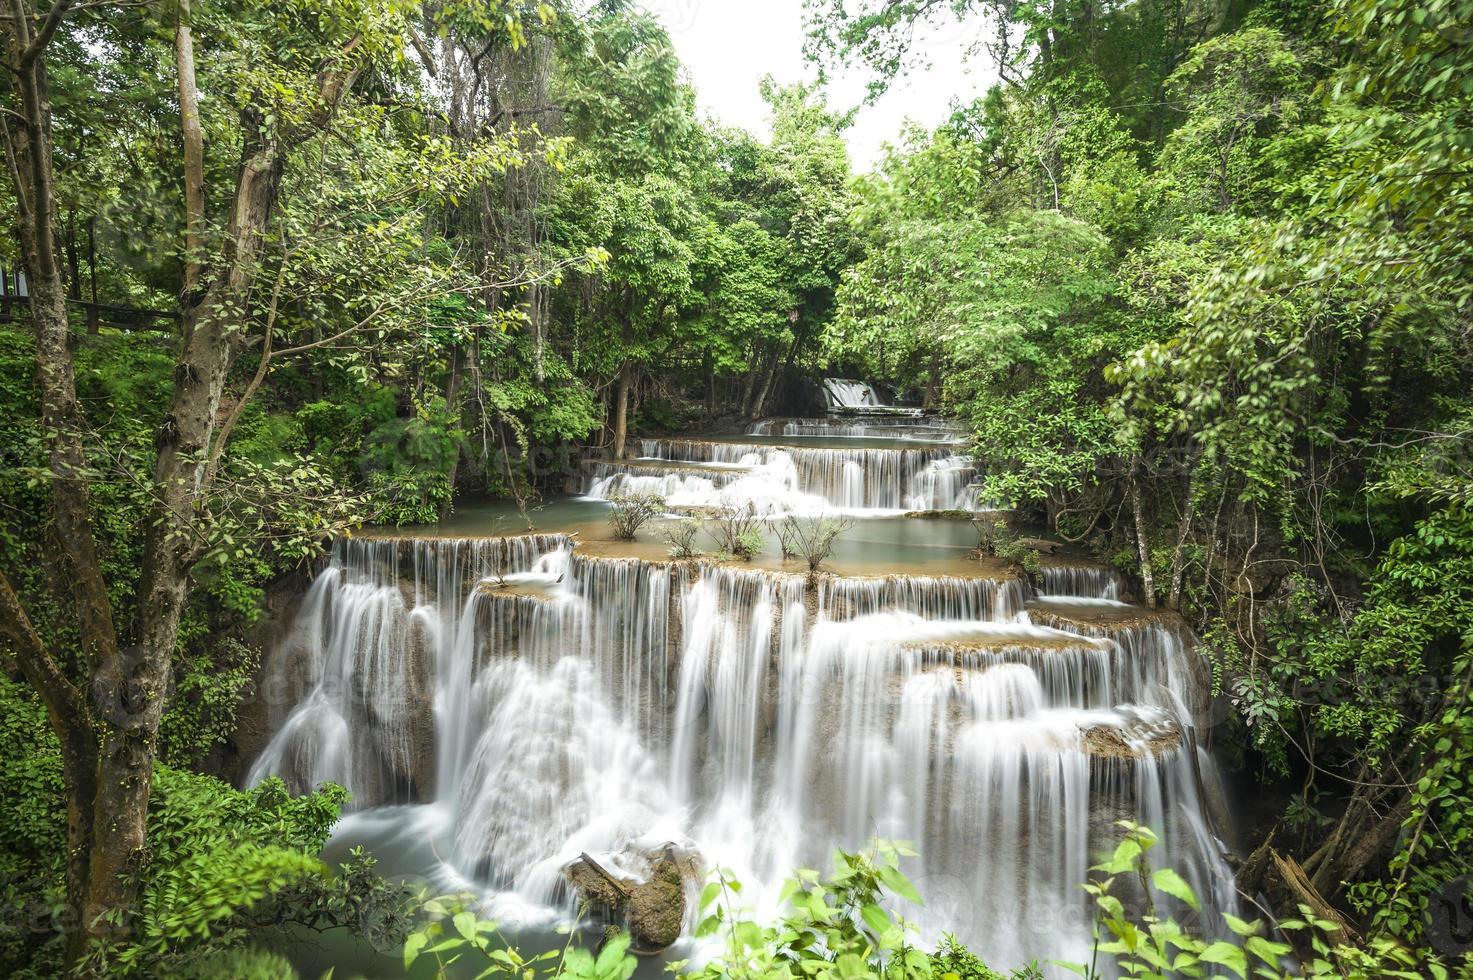 huai mae khamin cascata nella foresta thailandese foto